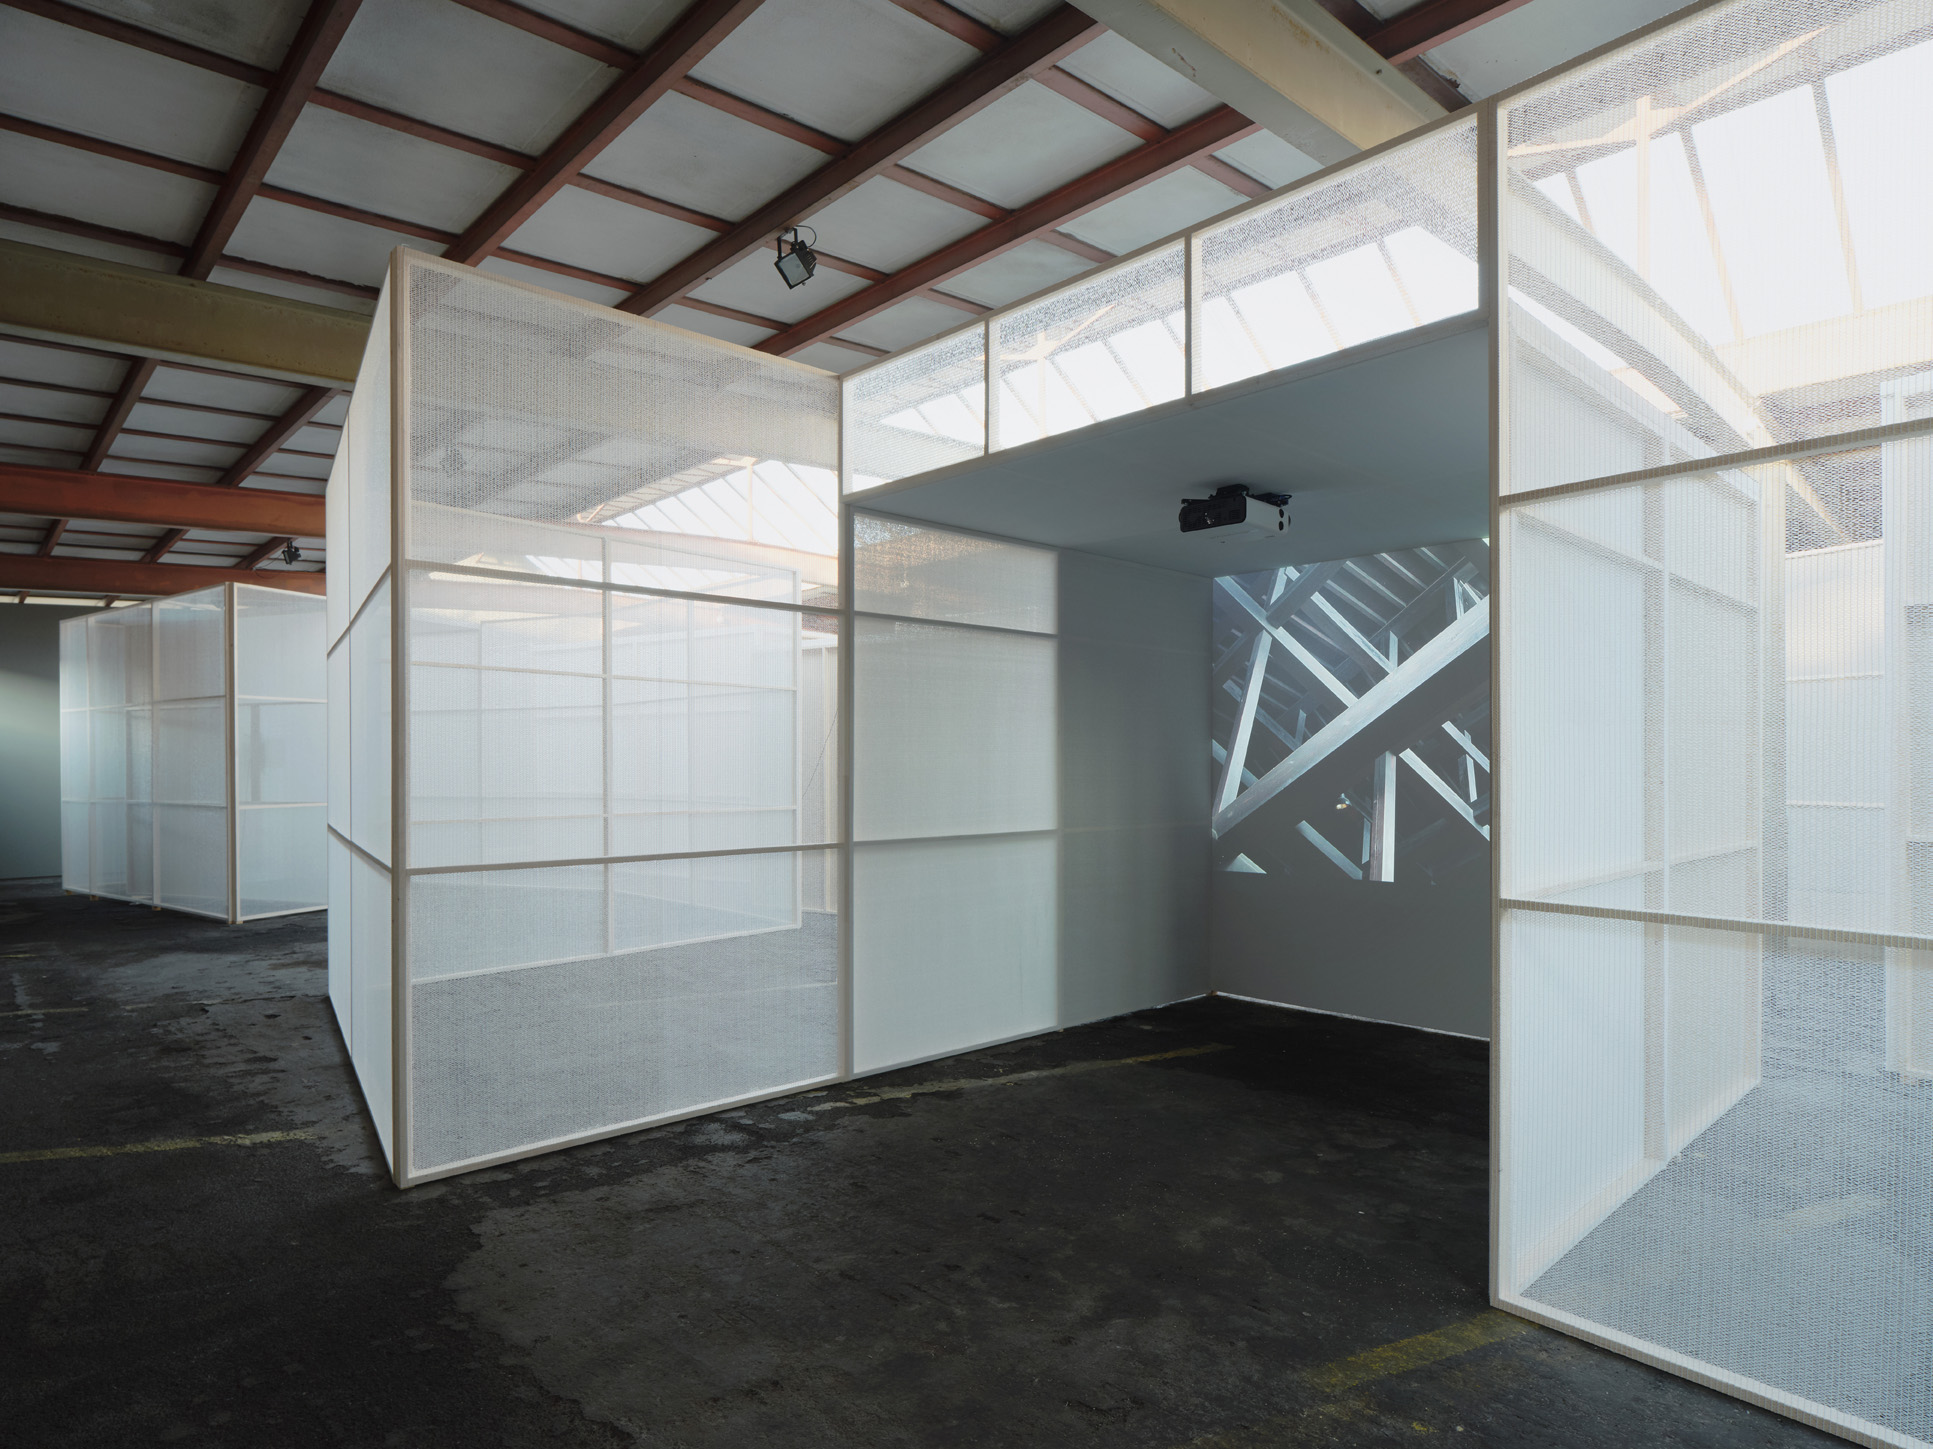 Daniel Robert Hunziker, Kunsthalle Arbon, 2019